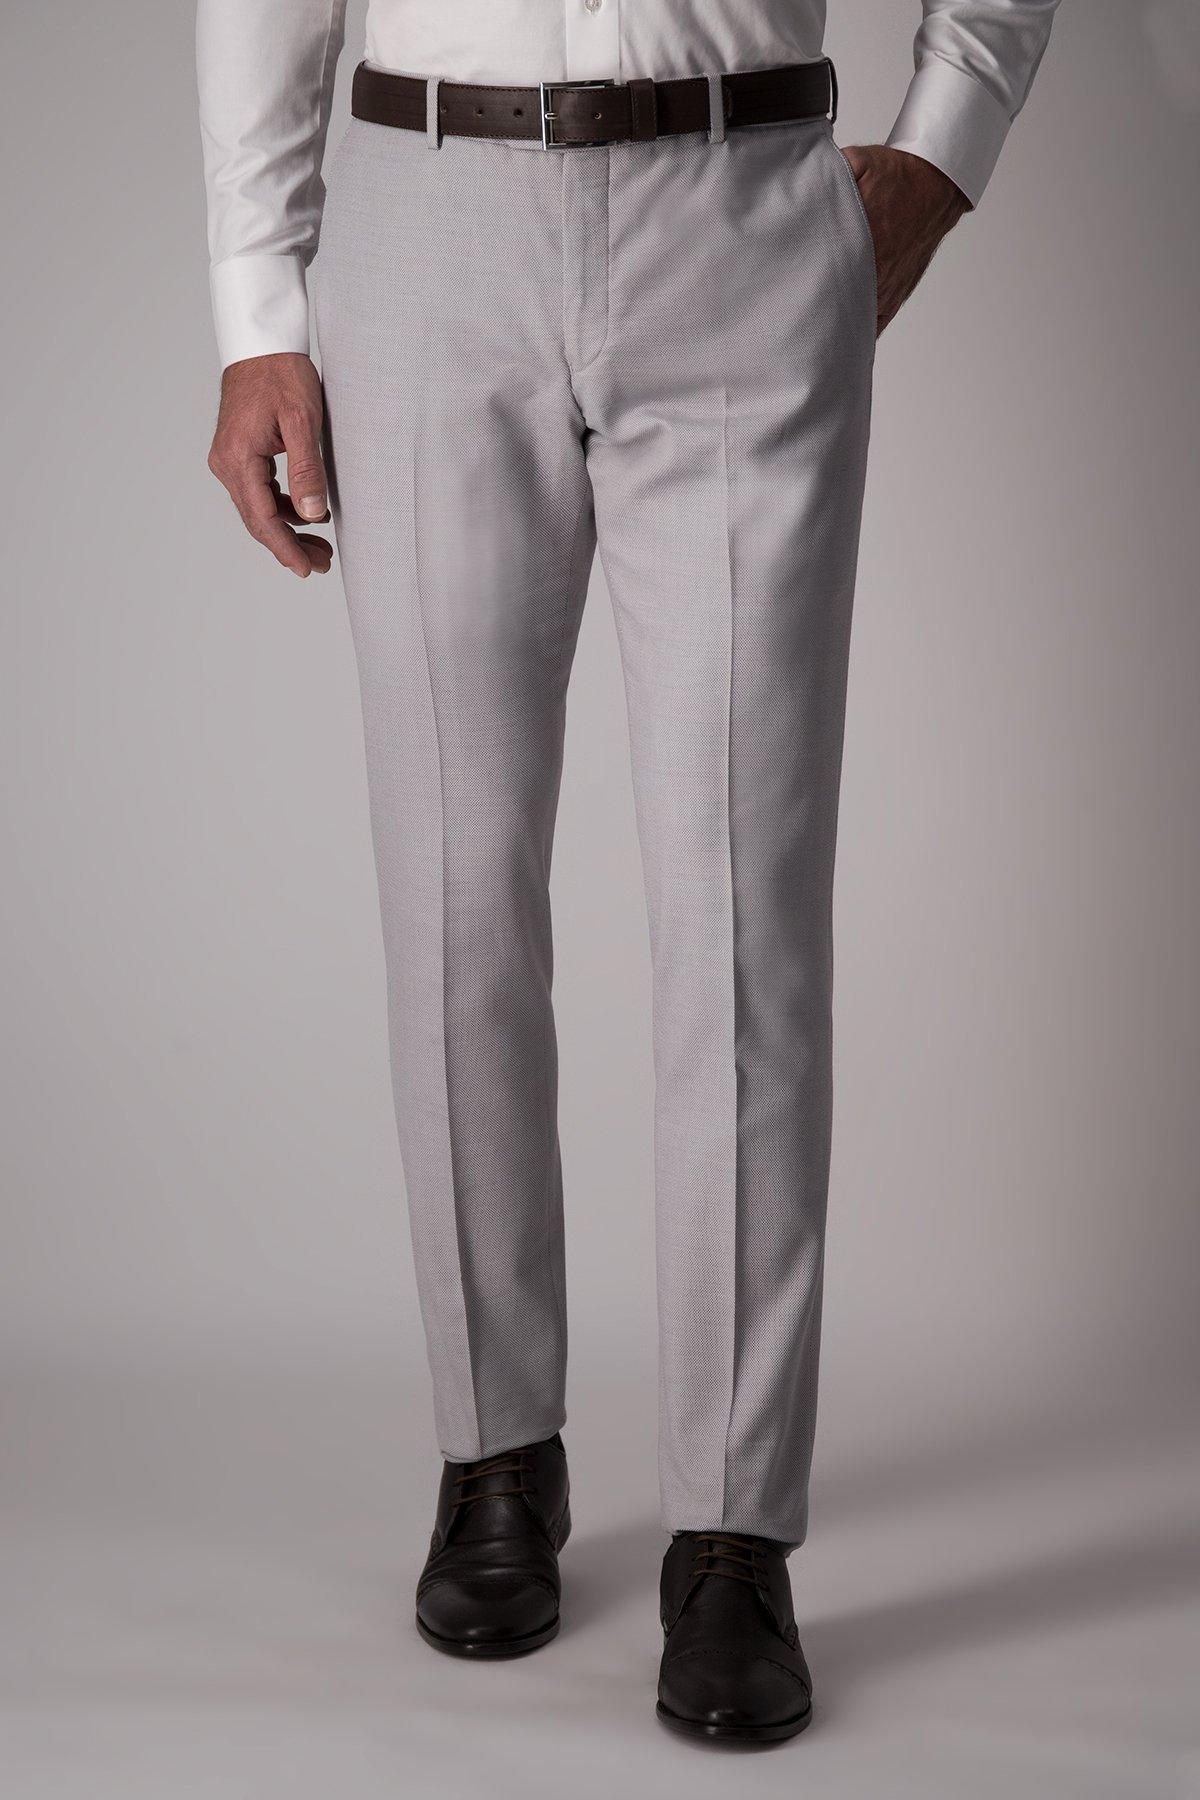 Pantalón Robert´s, lana y algodón, slim, micro diseño gris.